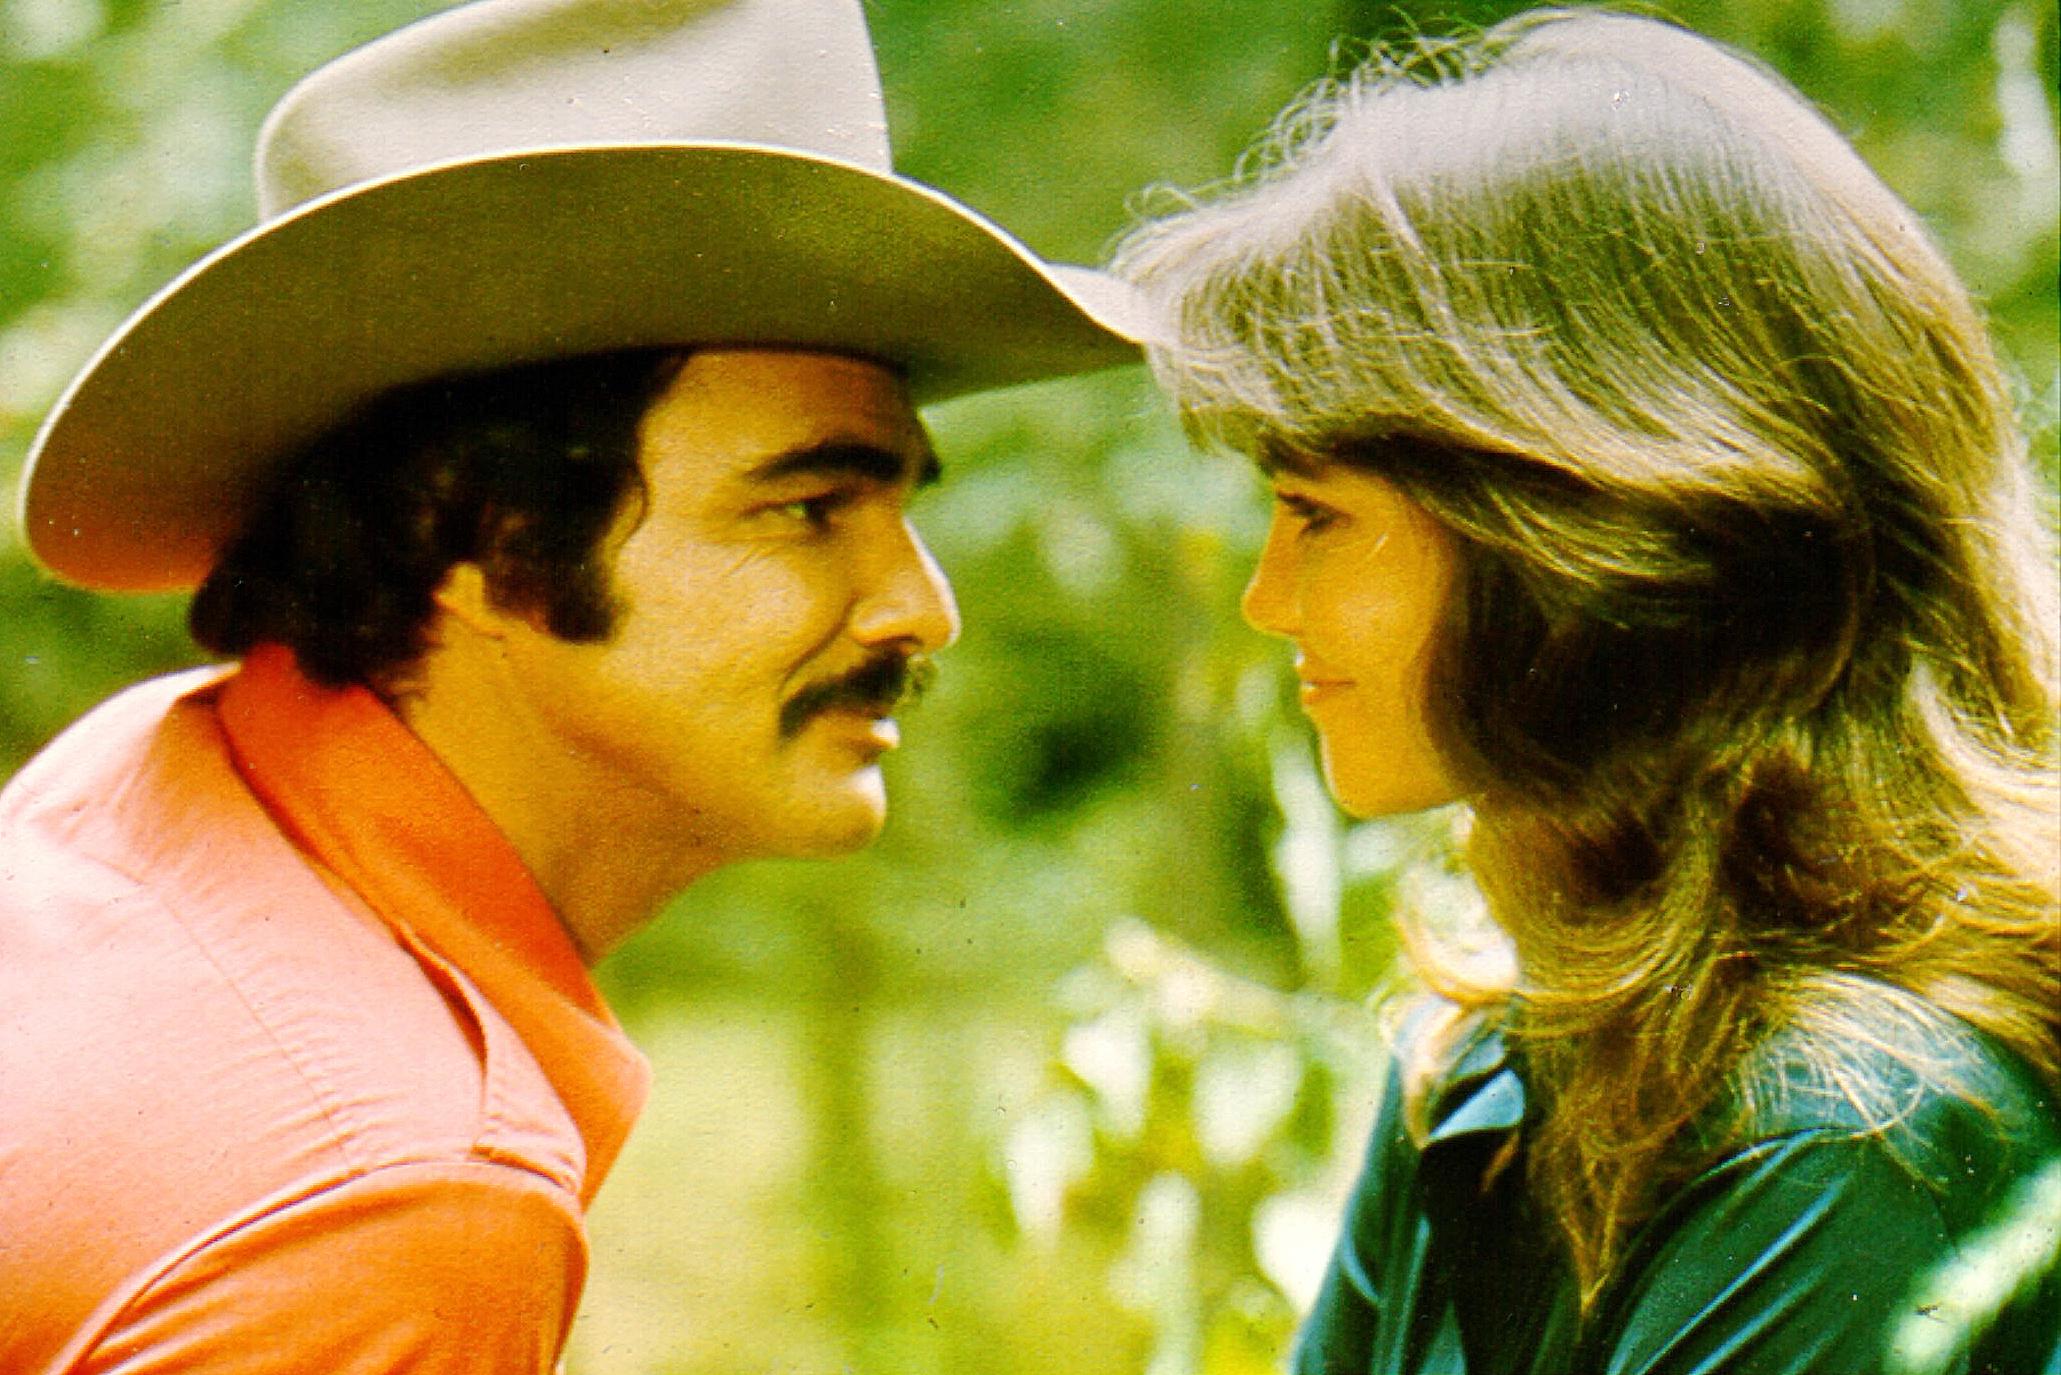 Burt Reynolds Sally Field Smokey and the Bandit.